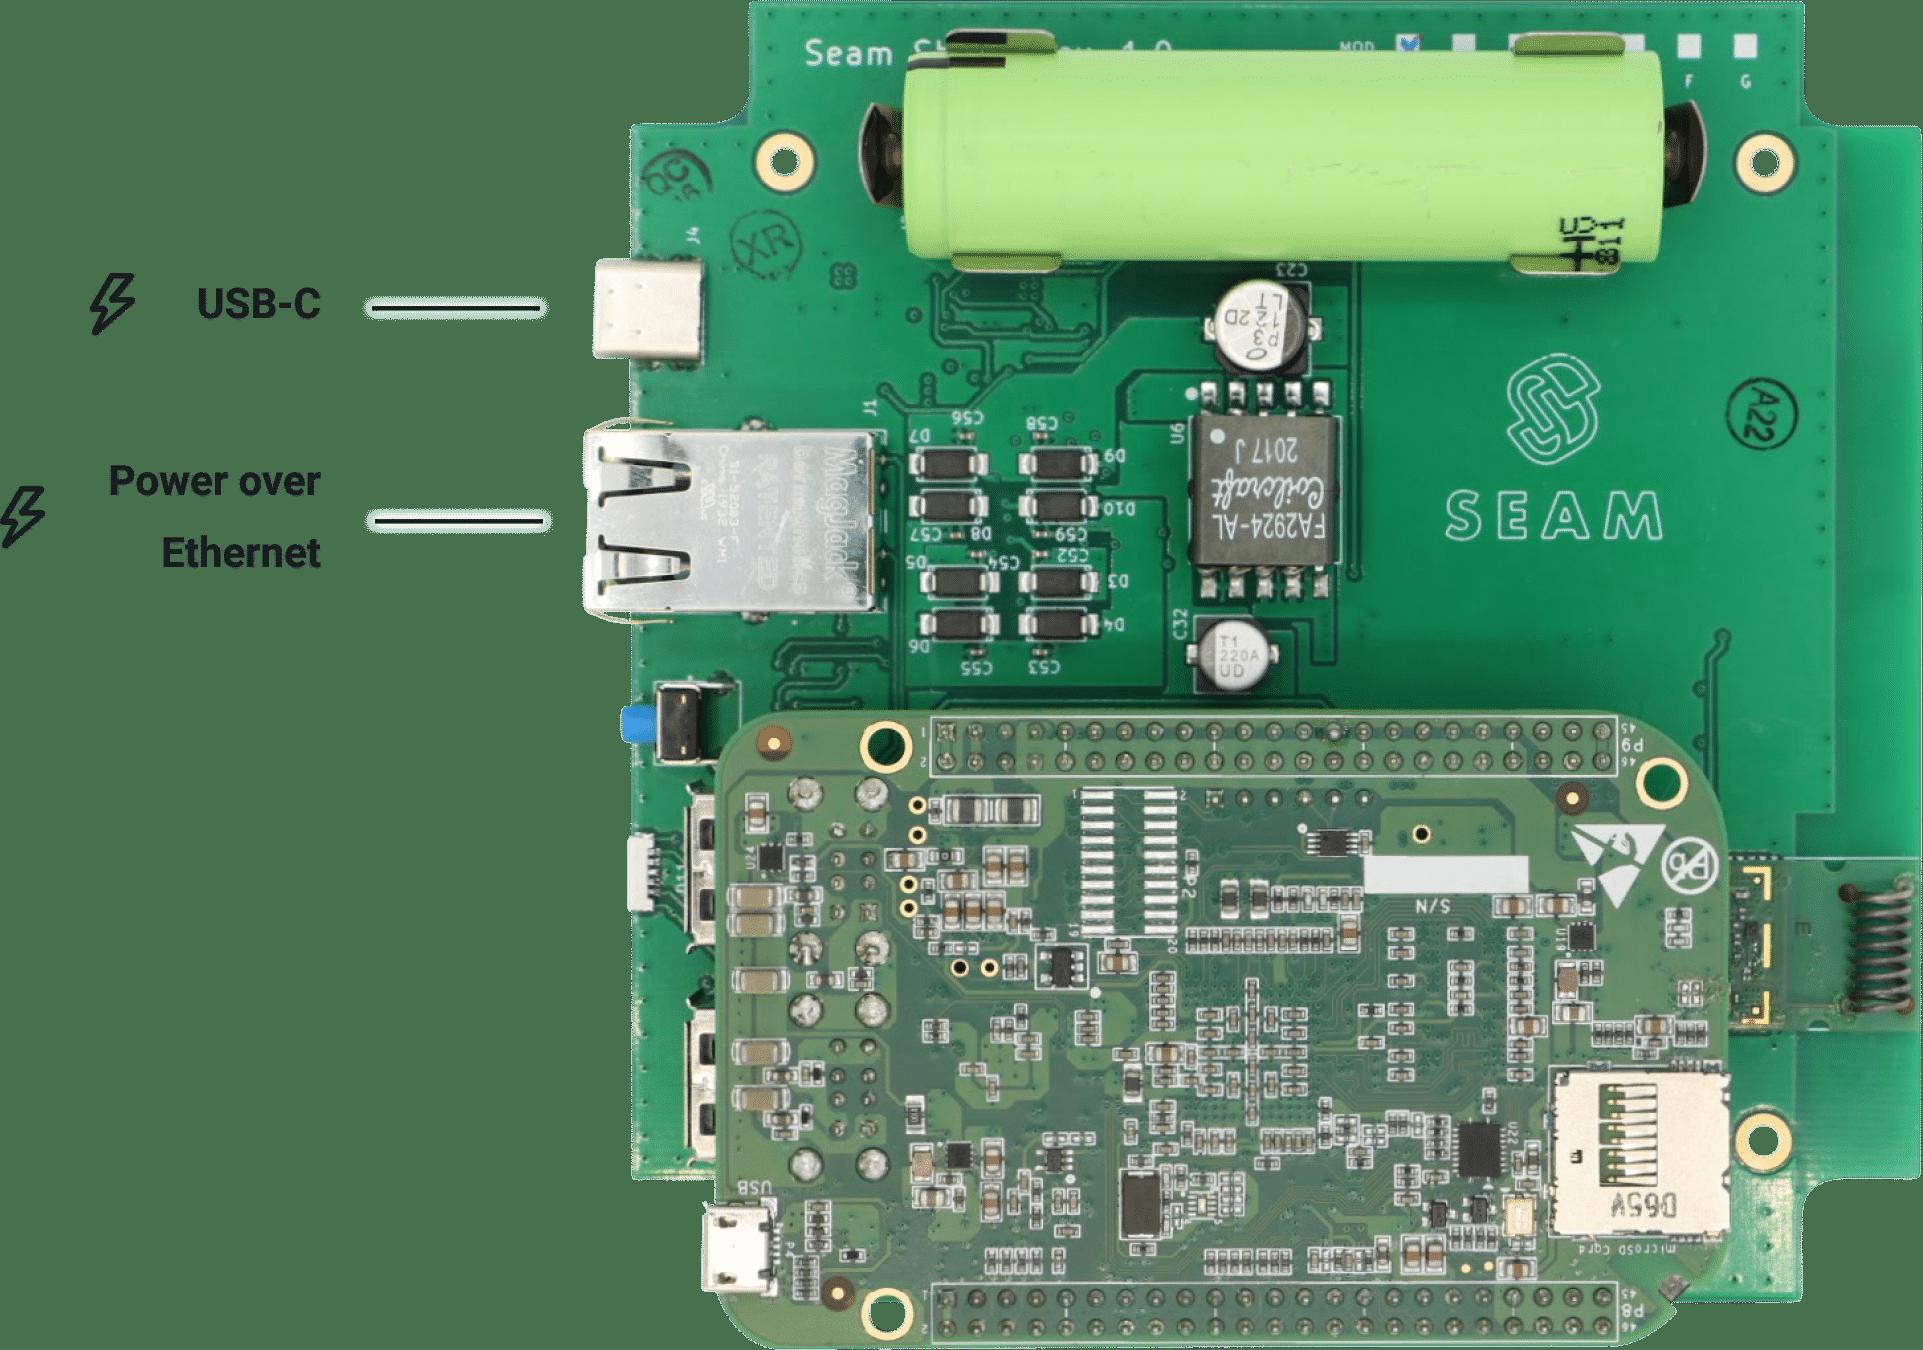 Seam Hub Power Options